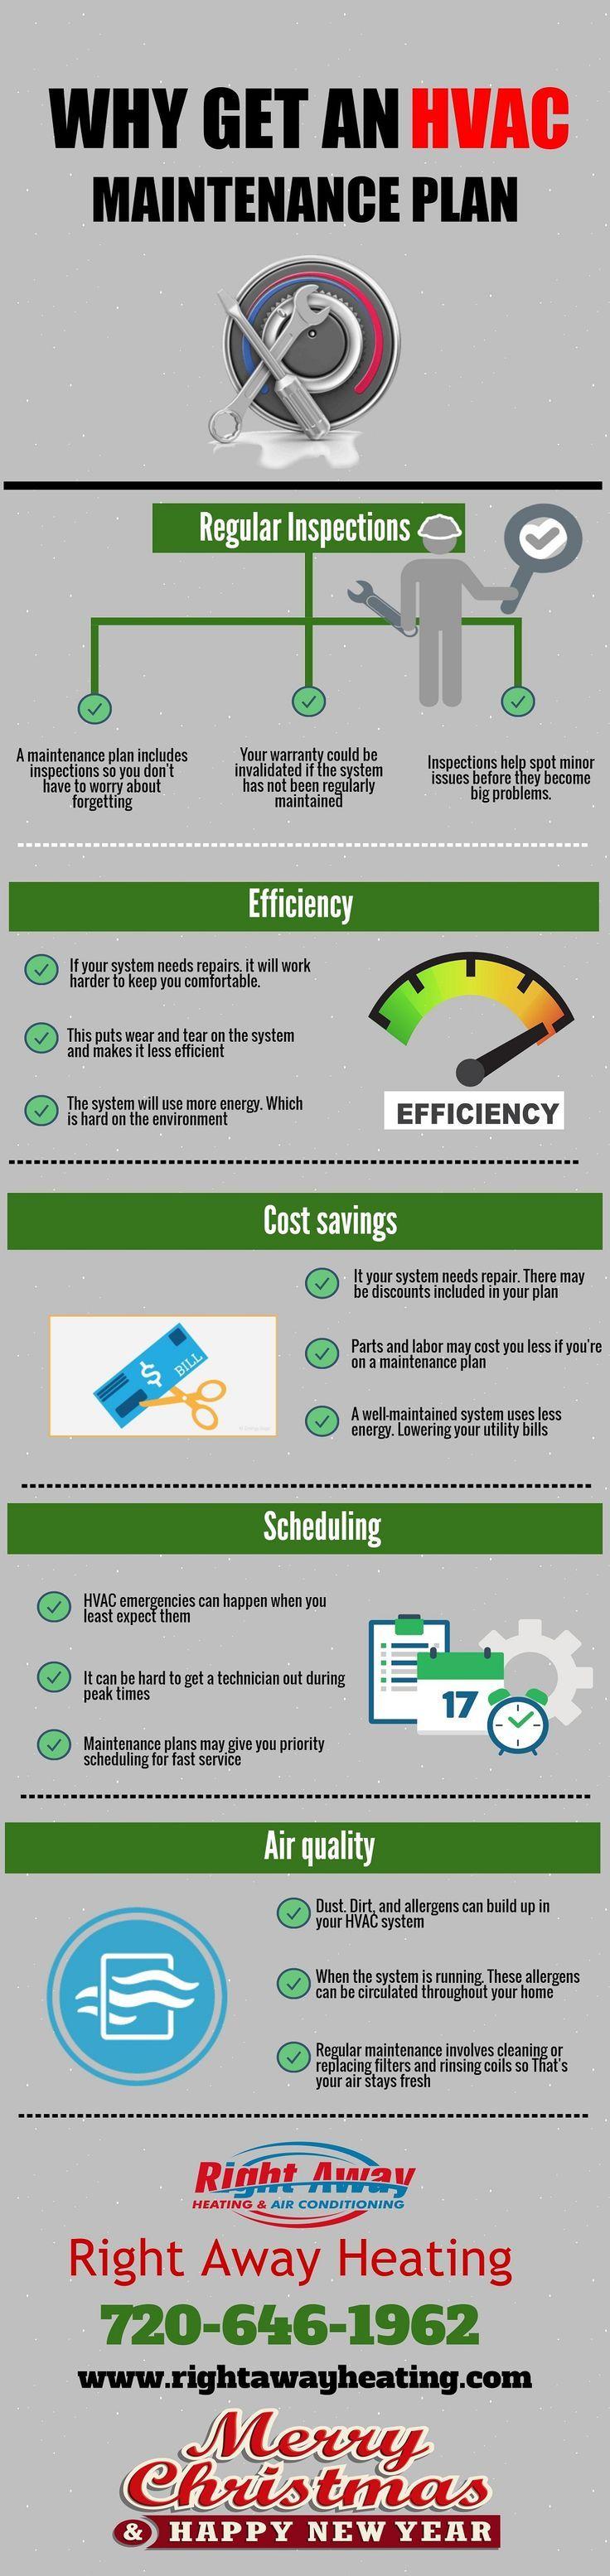 Why Get an HVAC Maintenance Plan #HVAC #EnvironmentalHeatingCooling